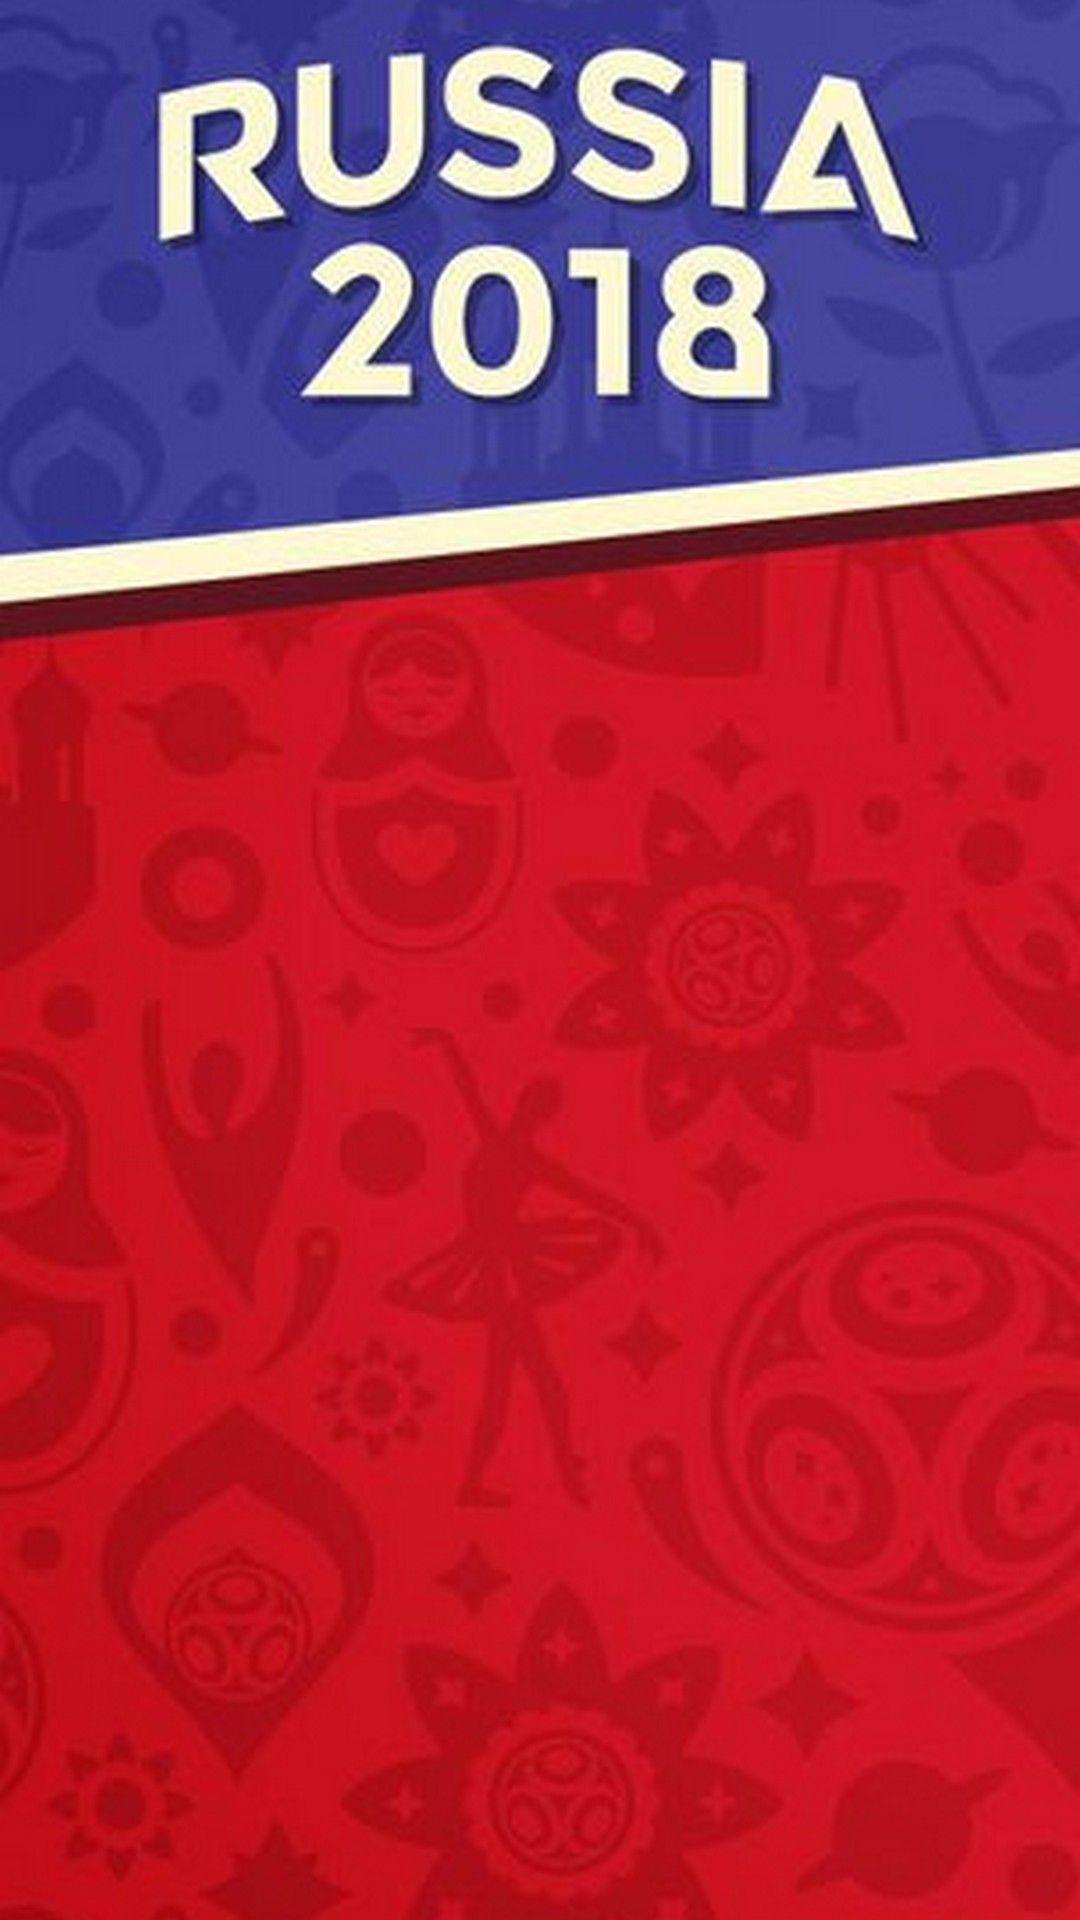 iPhone Wallpaper FIFA World Cup Fond d'écran iphone